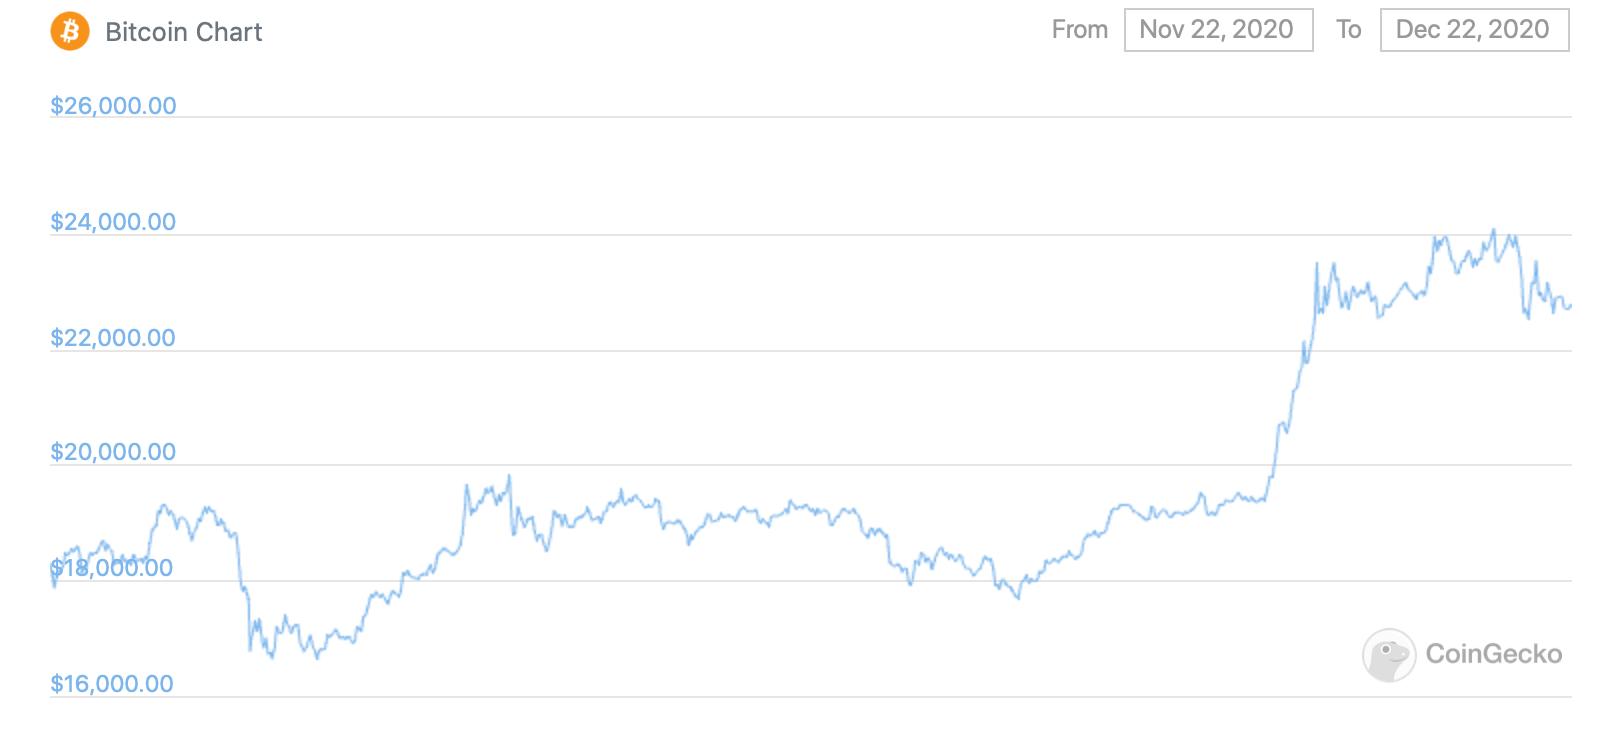 График курса Биткоина за последний месяц